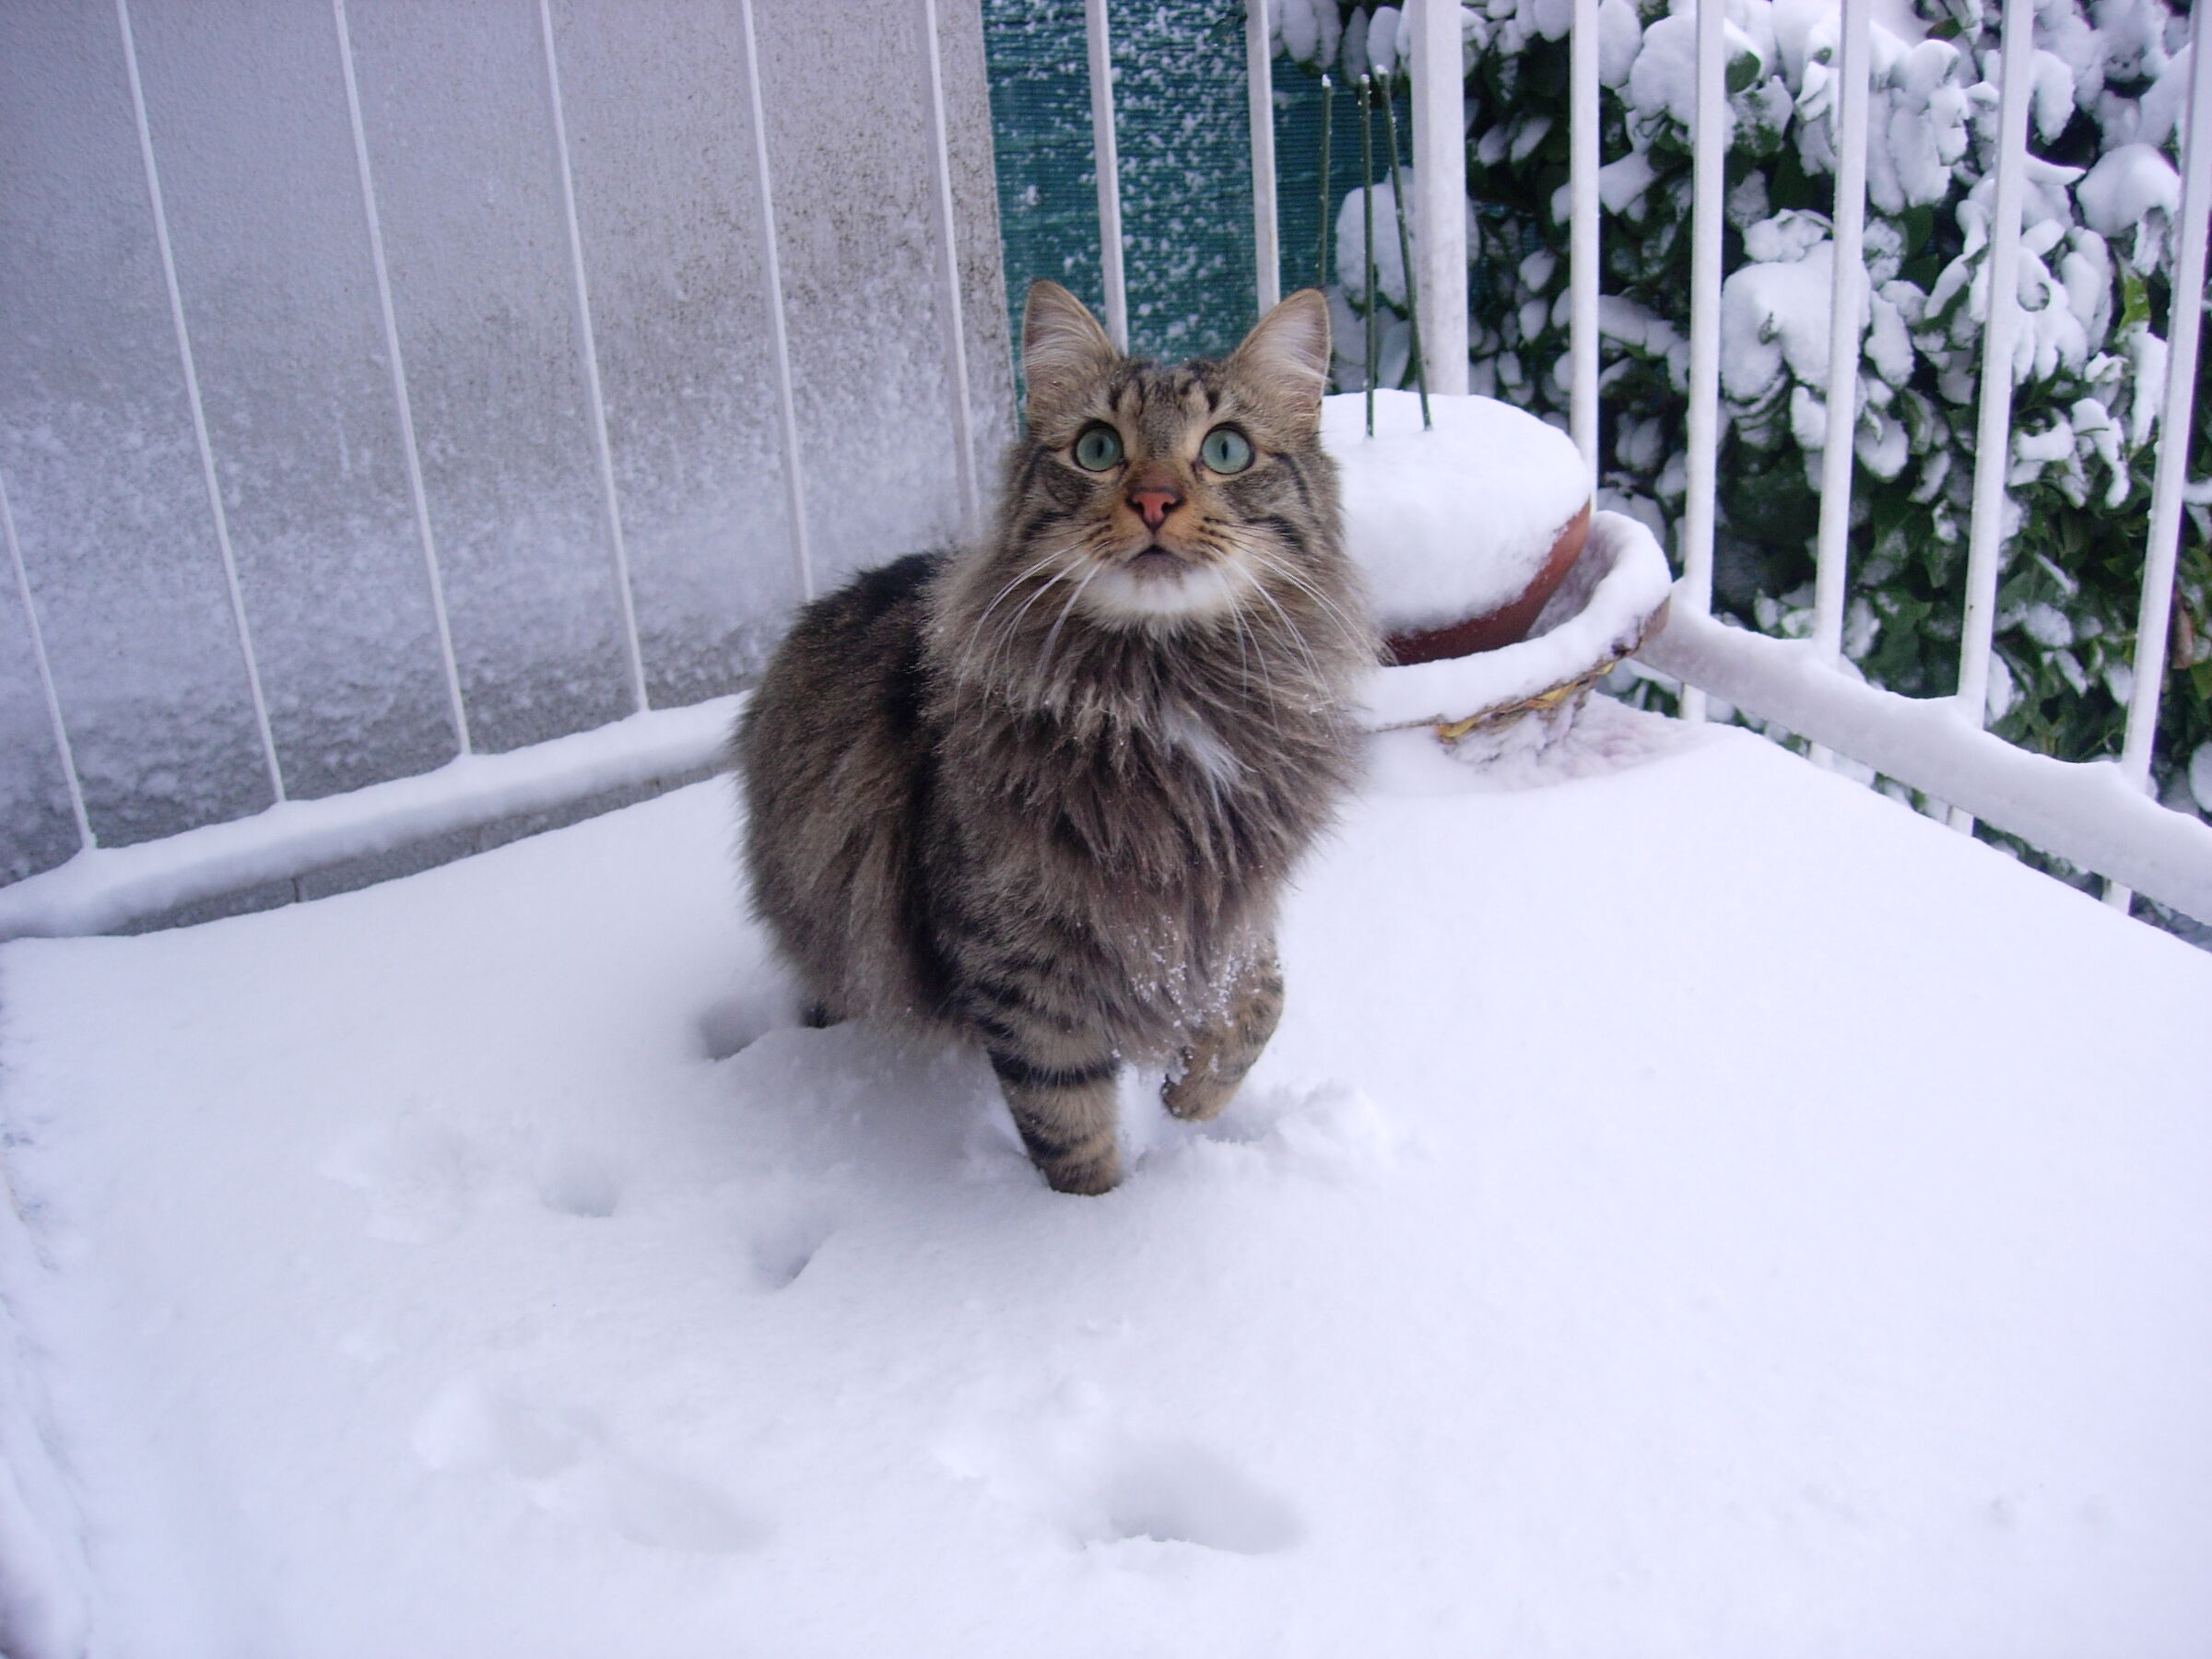 The Snowcat...